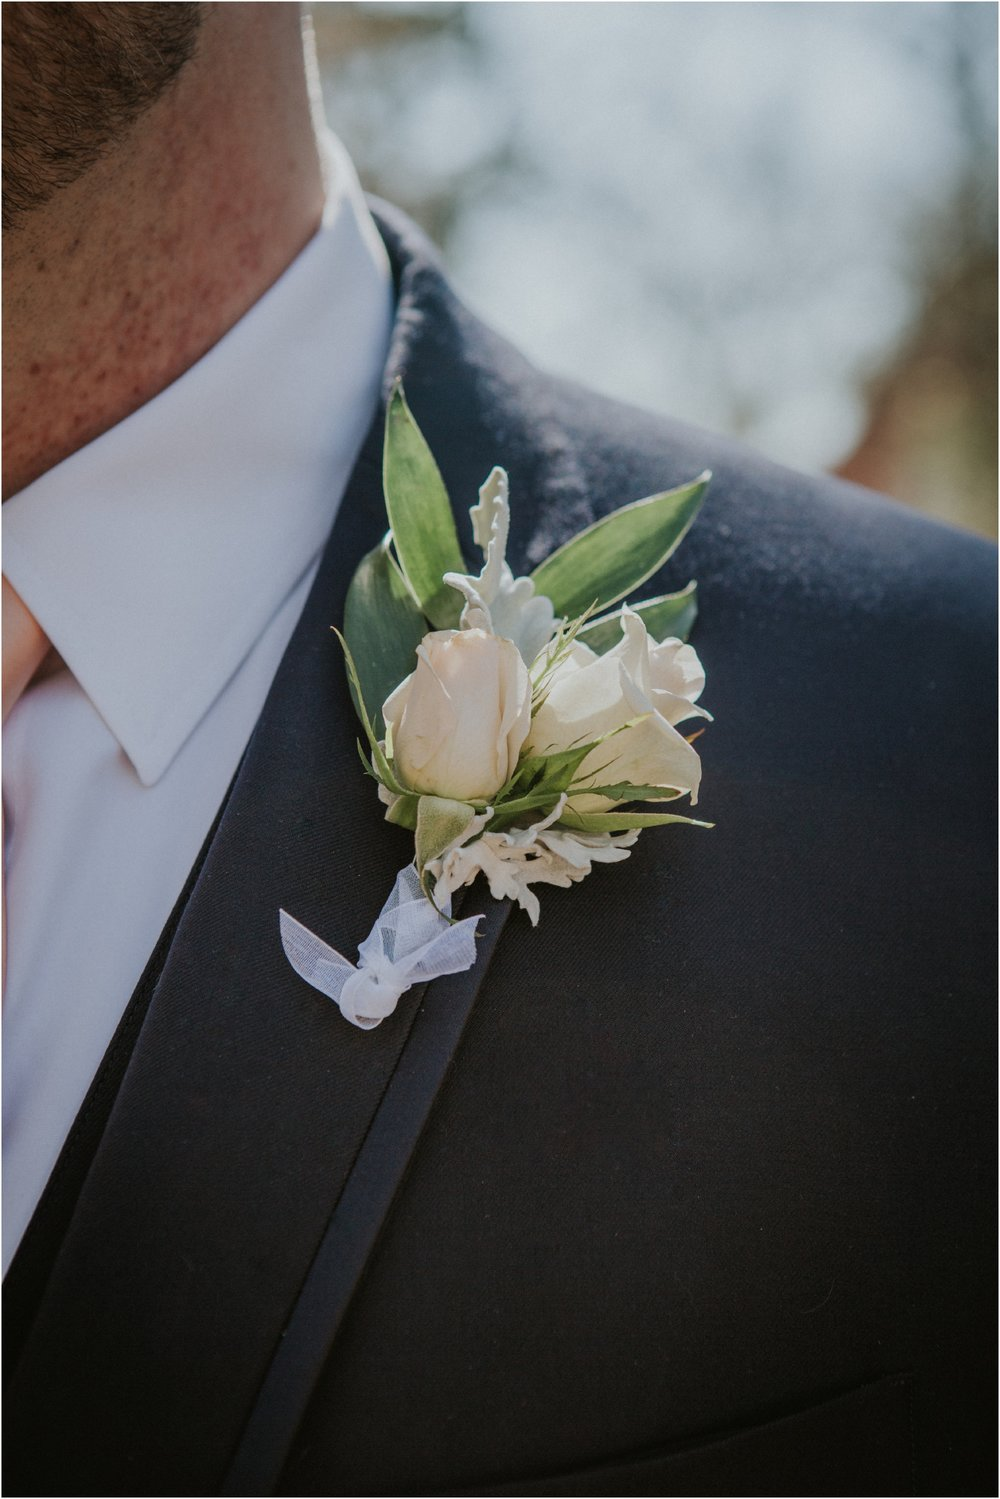 millstone-limestone-tn-tennessee-rustic-outdoors-pastel-lodge-cabin-venue-wedding-katy-sergent-photographer_0053.jpg